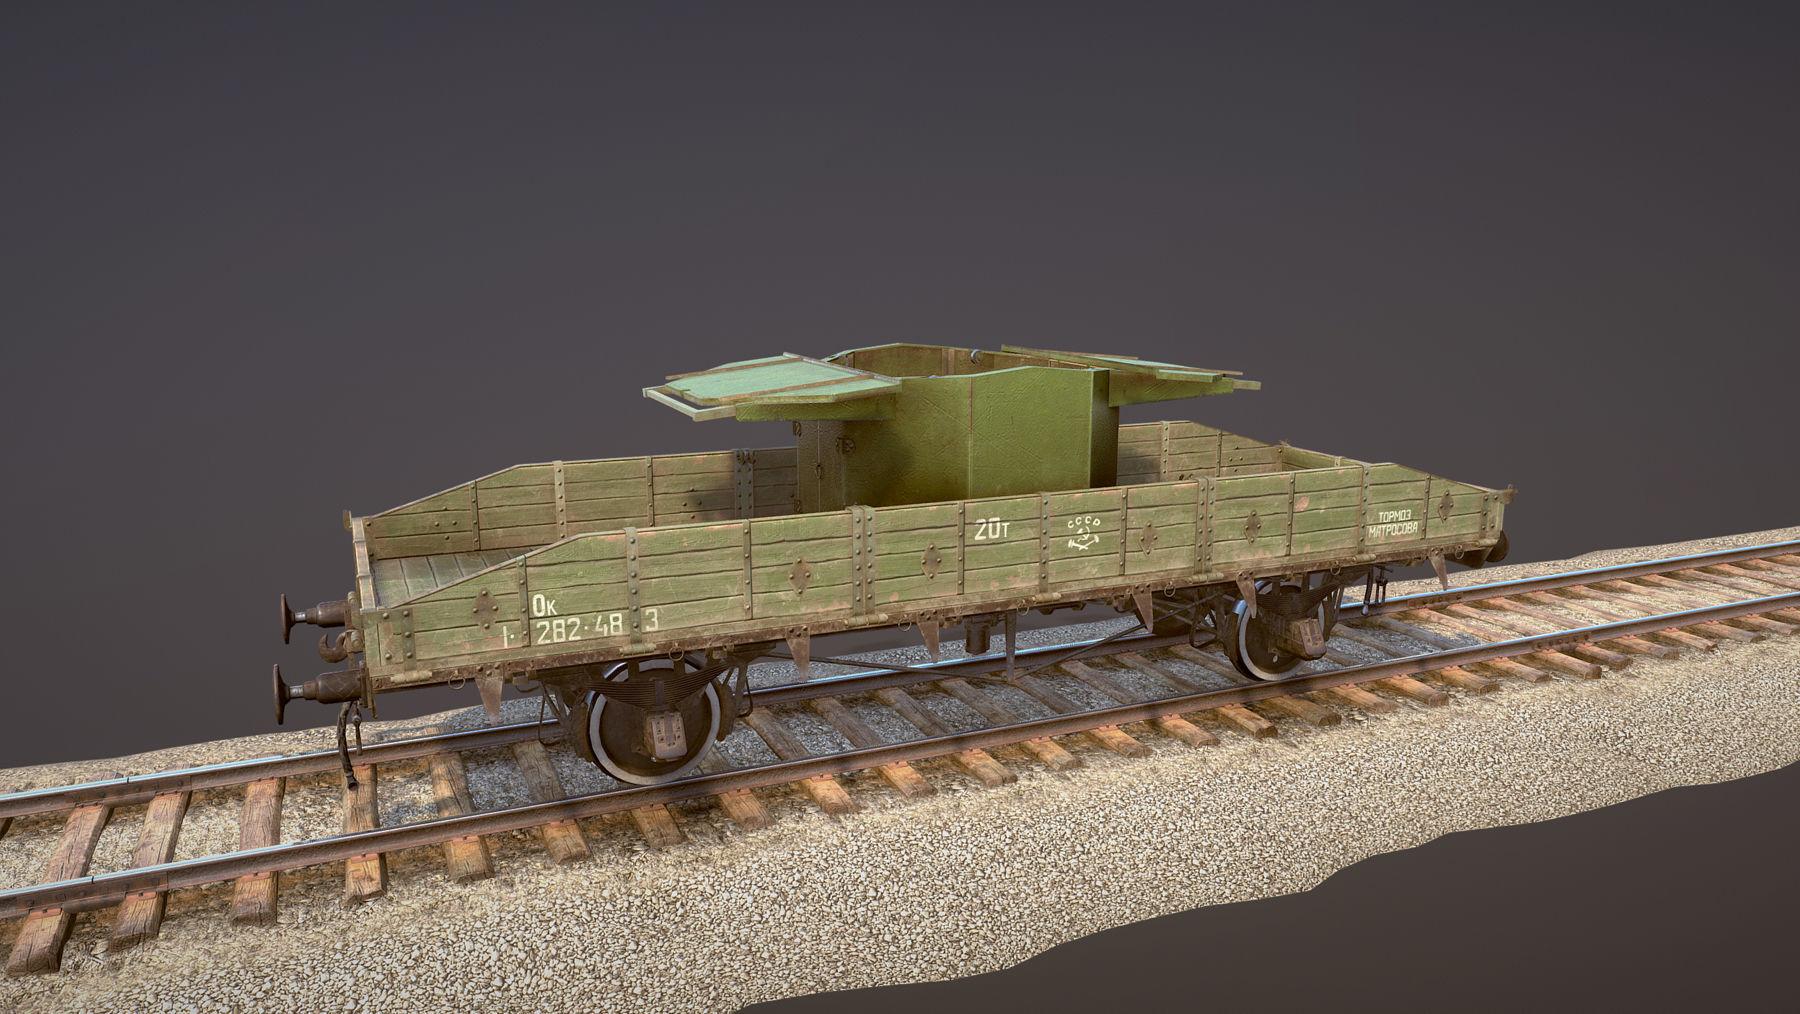 Armored Train SPU-BP railway anti-aircraft platform